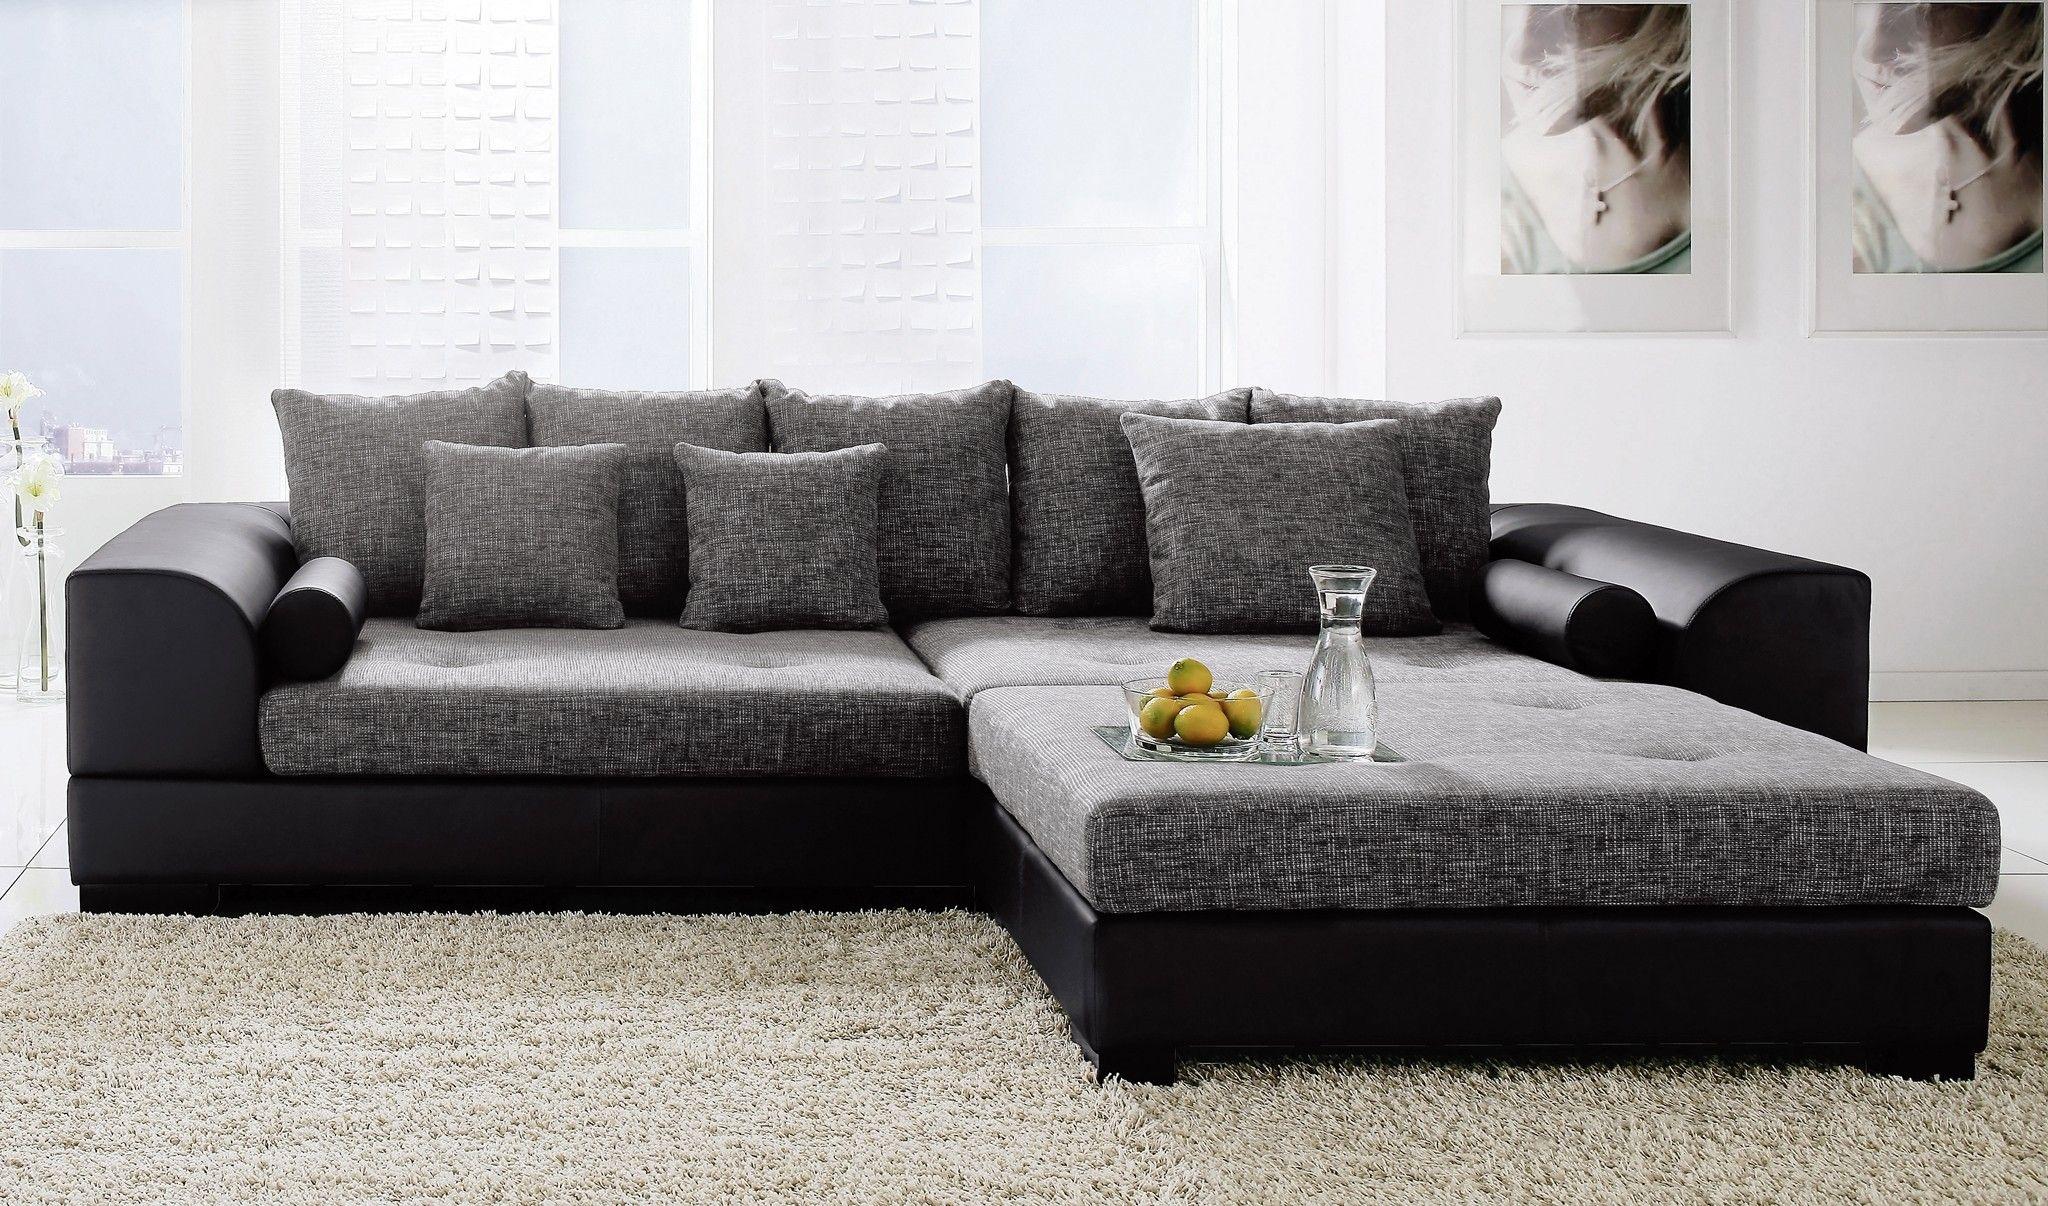 Big Sofas Sofa Furniture Beige Living Room Furniture Furniture